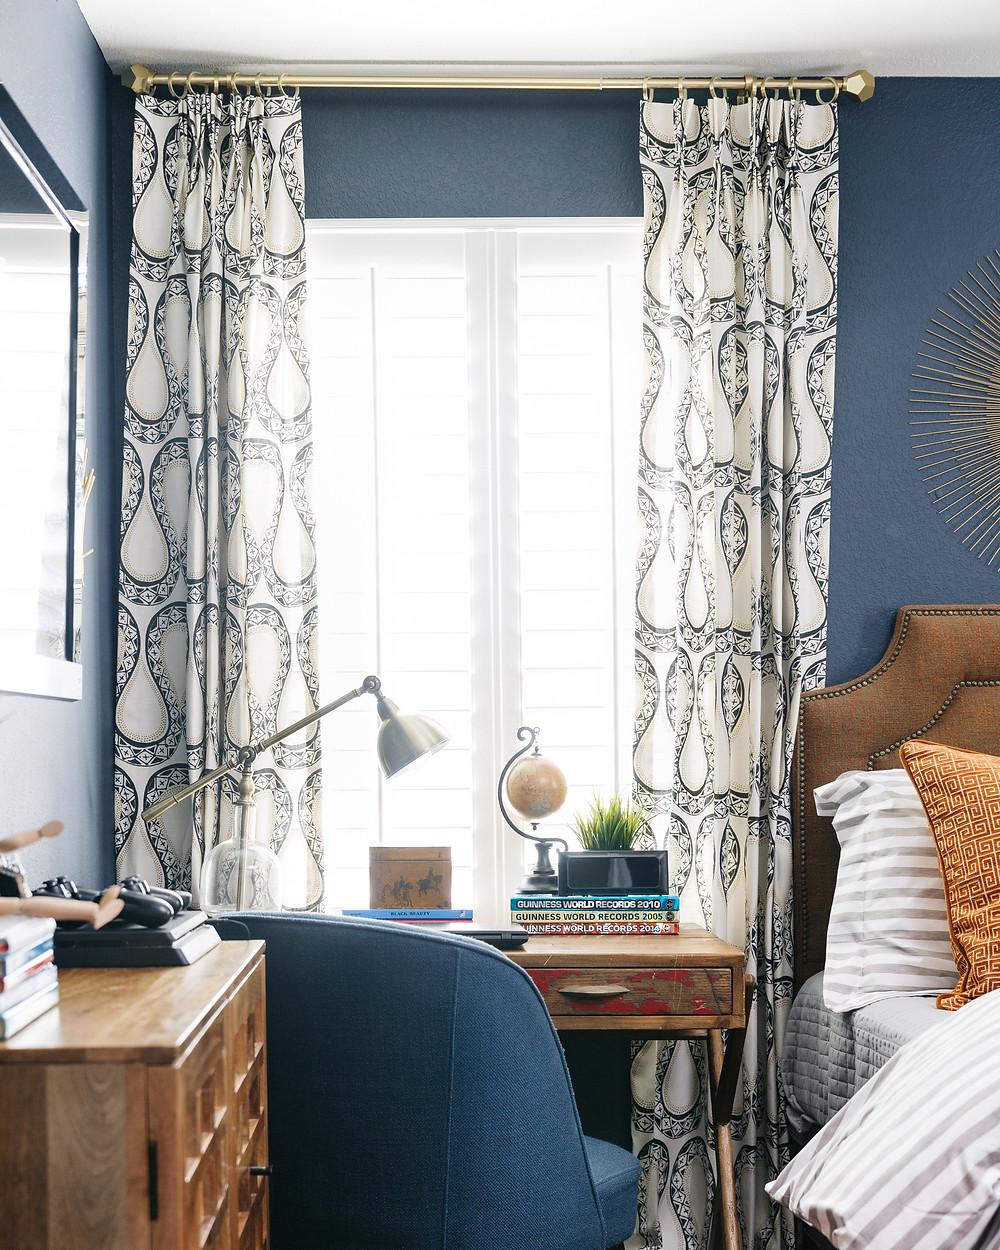 custom draperies and desk vignette in a boy's bedroom